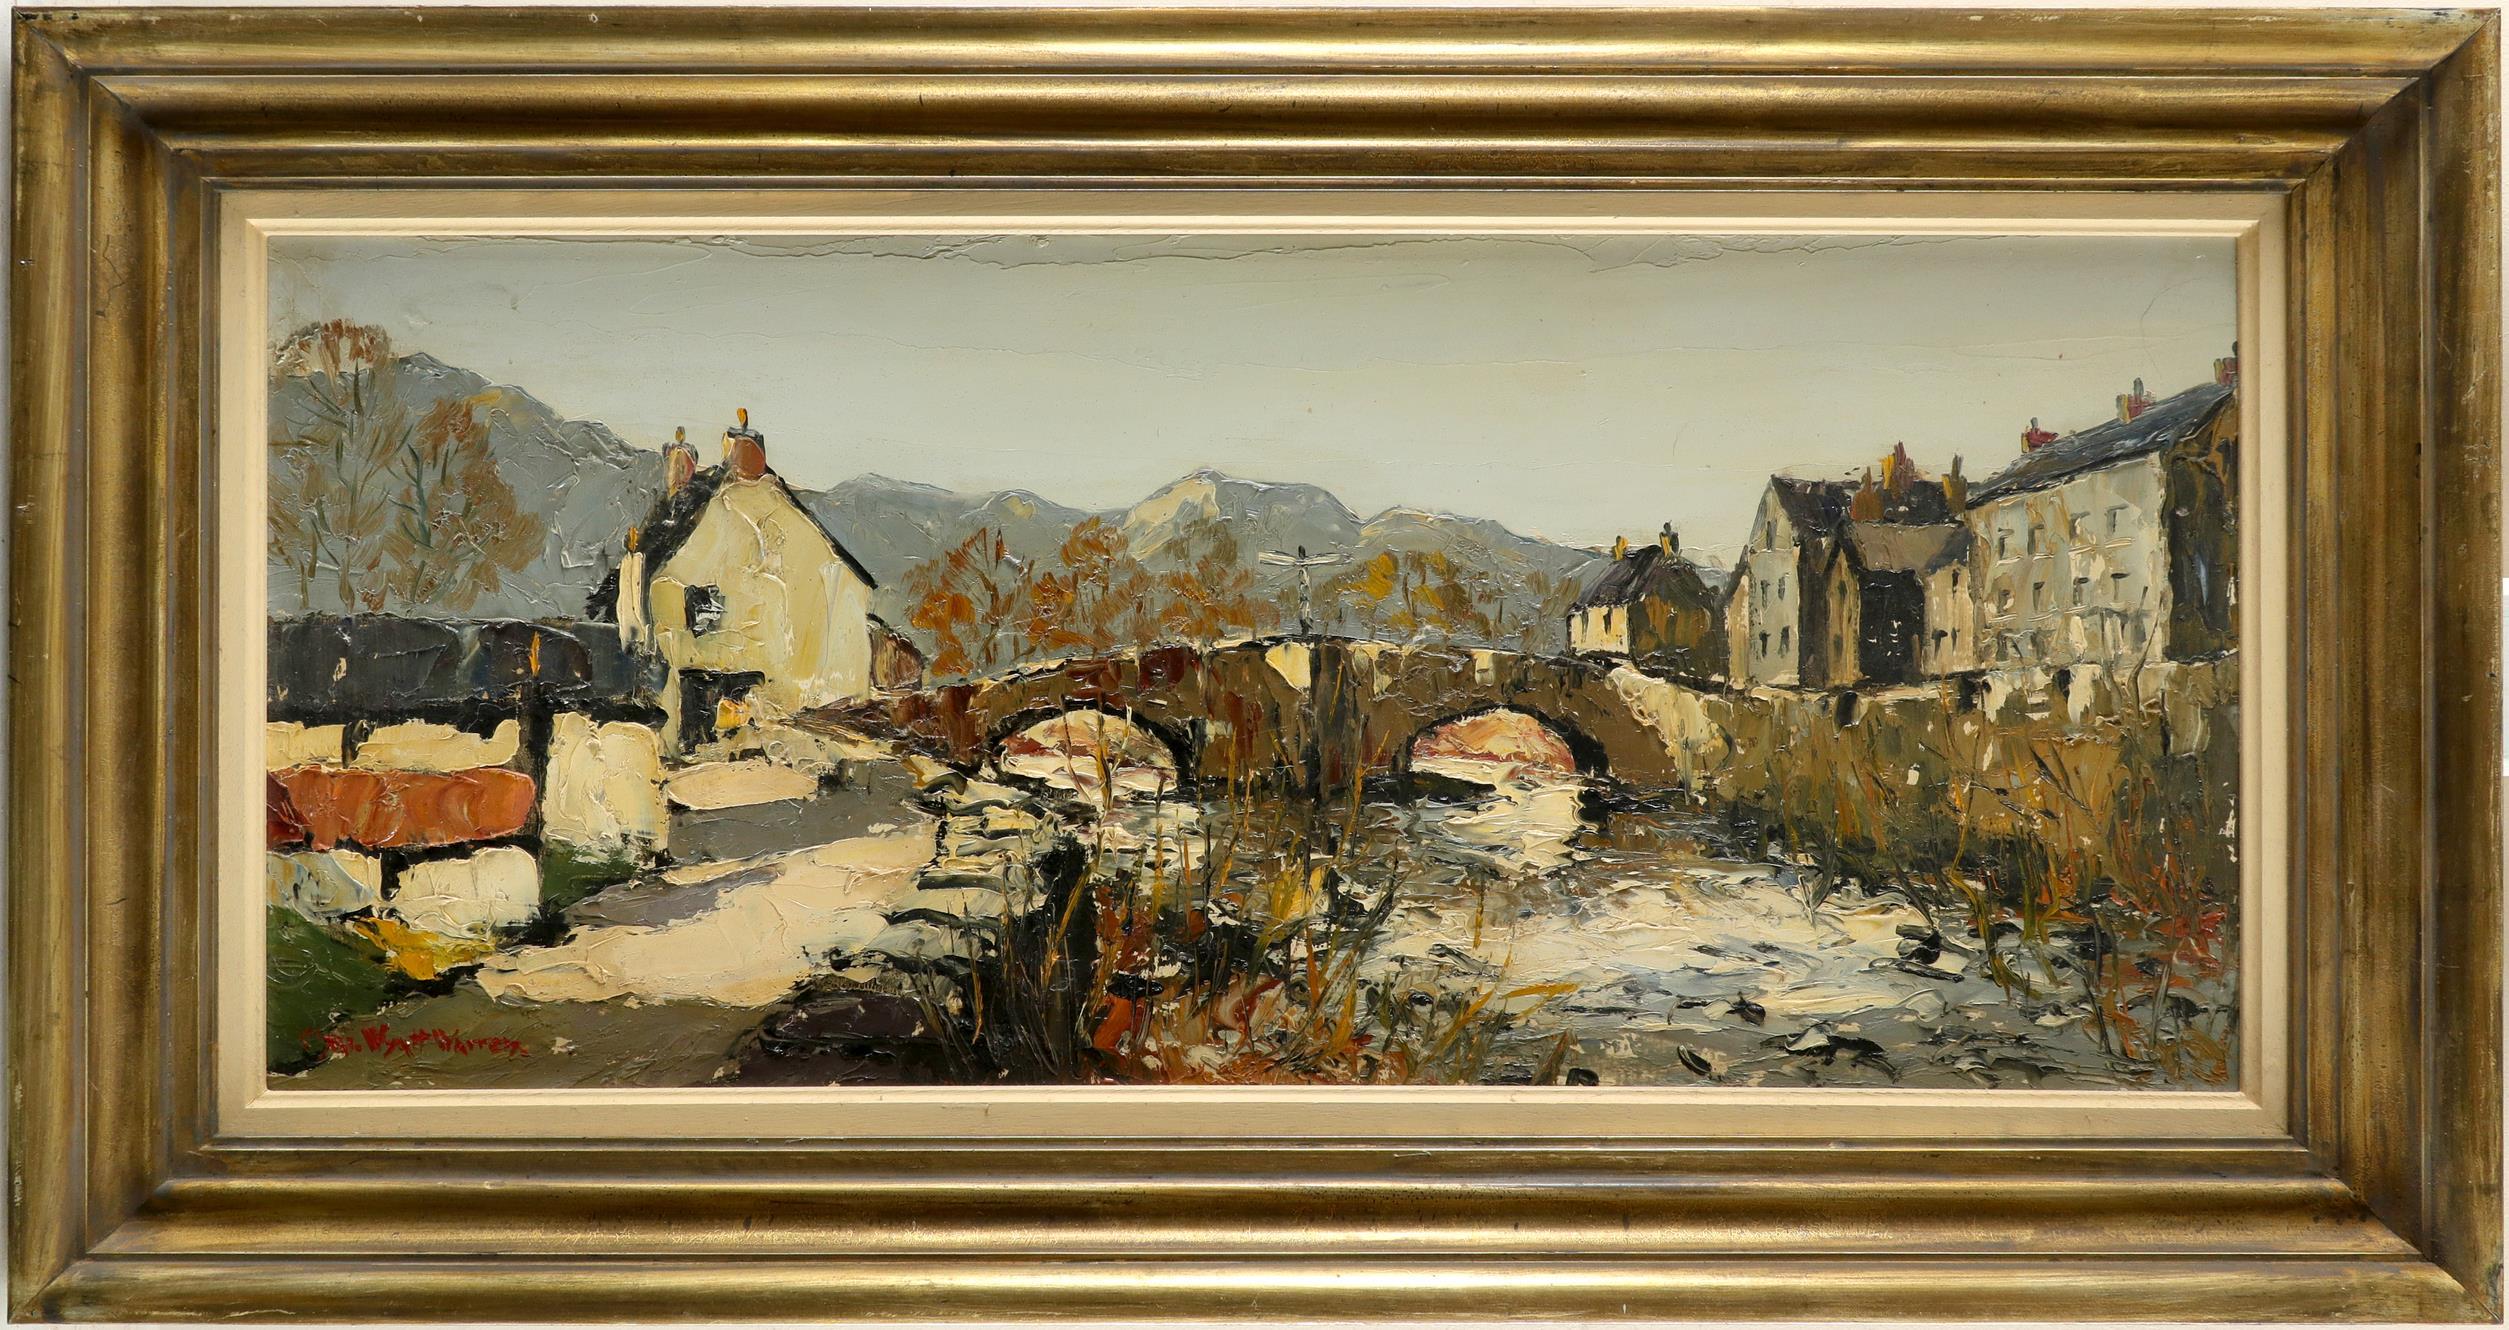 ‡Charles Wyatt Warren (Welsh 1908-1993) Beddgelert in Snowdonia, Wales Signed Chas. Wyatt Warren ( - Image 2 of 3